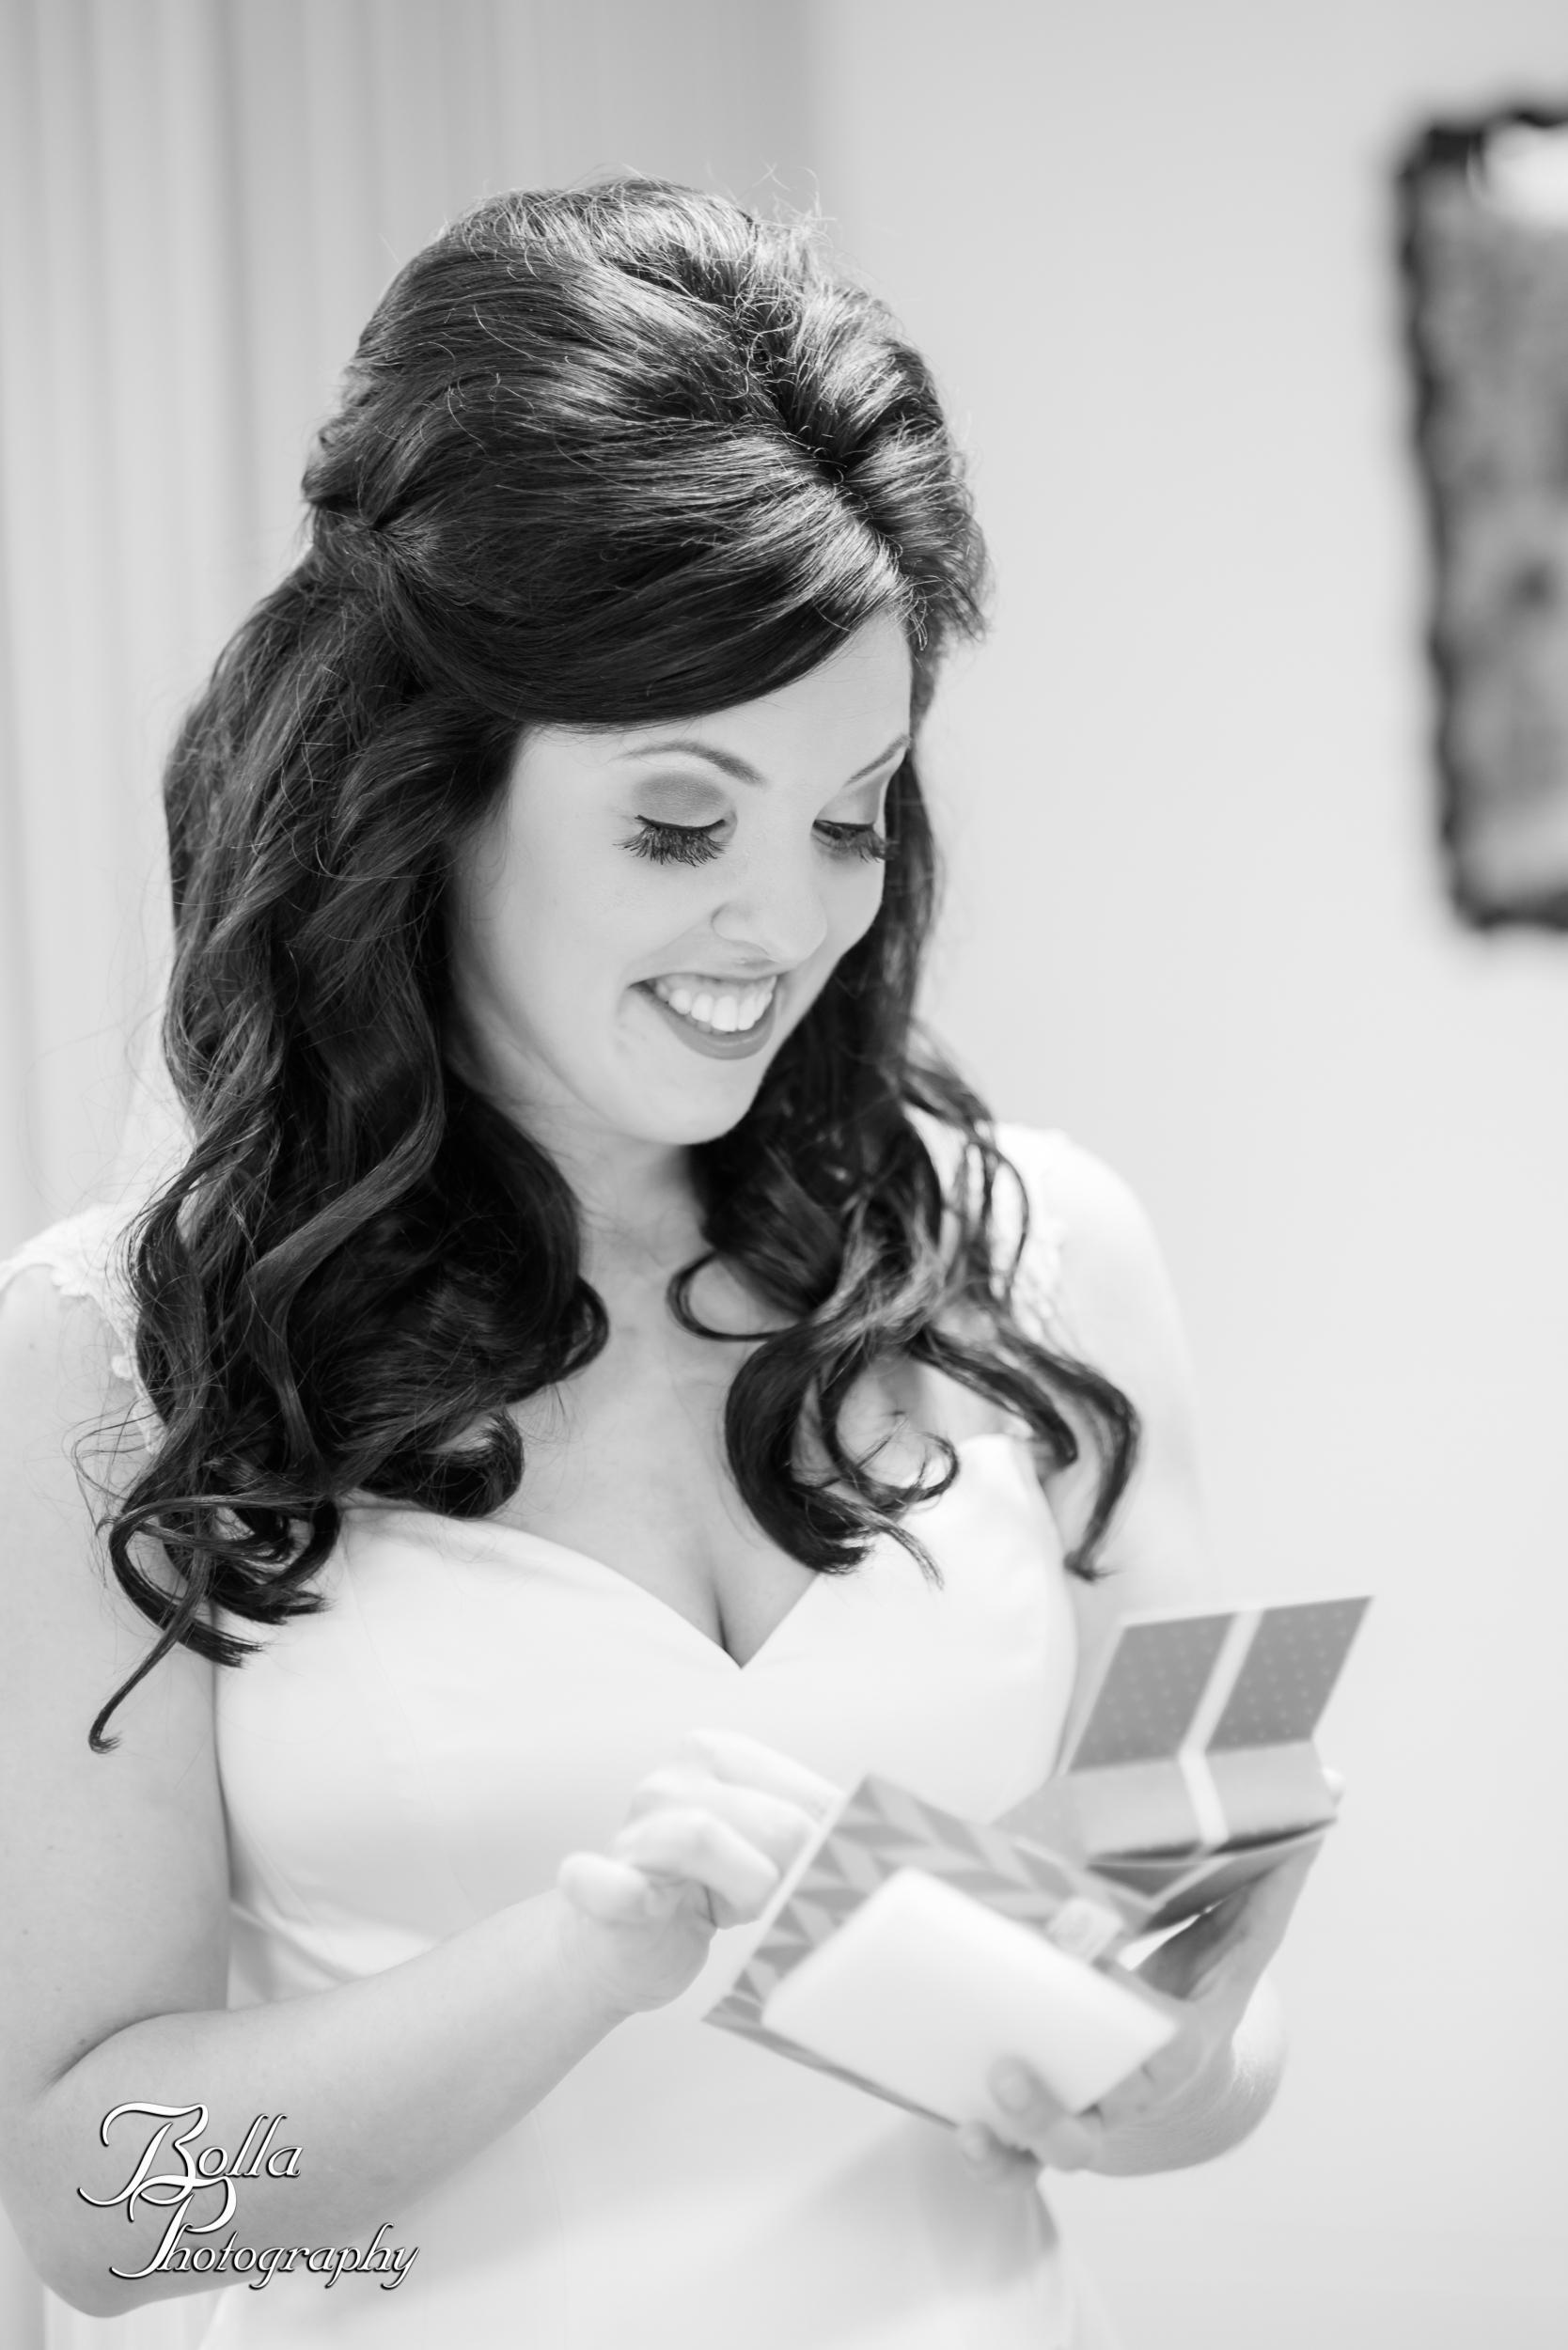 Bolla_photography_edwardsville_wedding_photographer_st_louis_weddings_Reilmann-0062.jpg